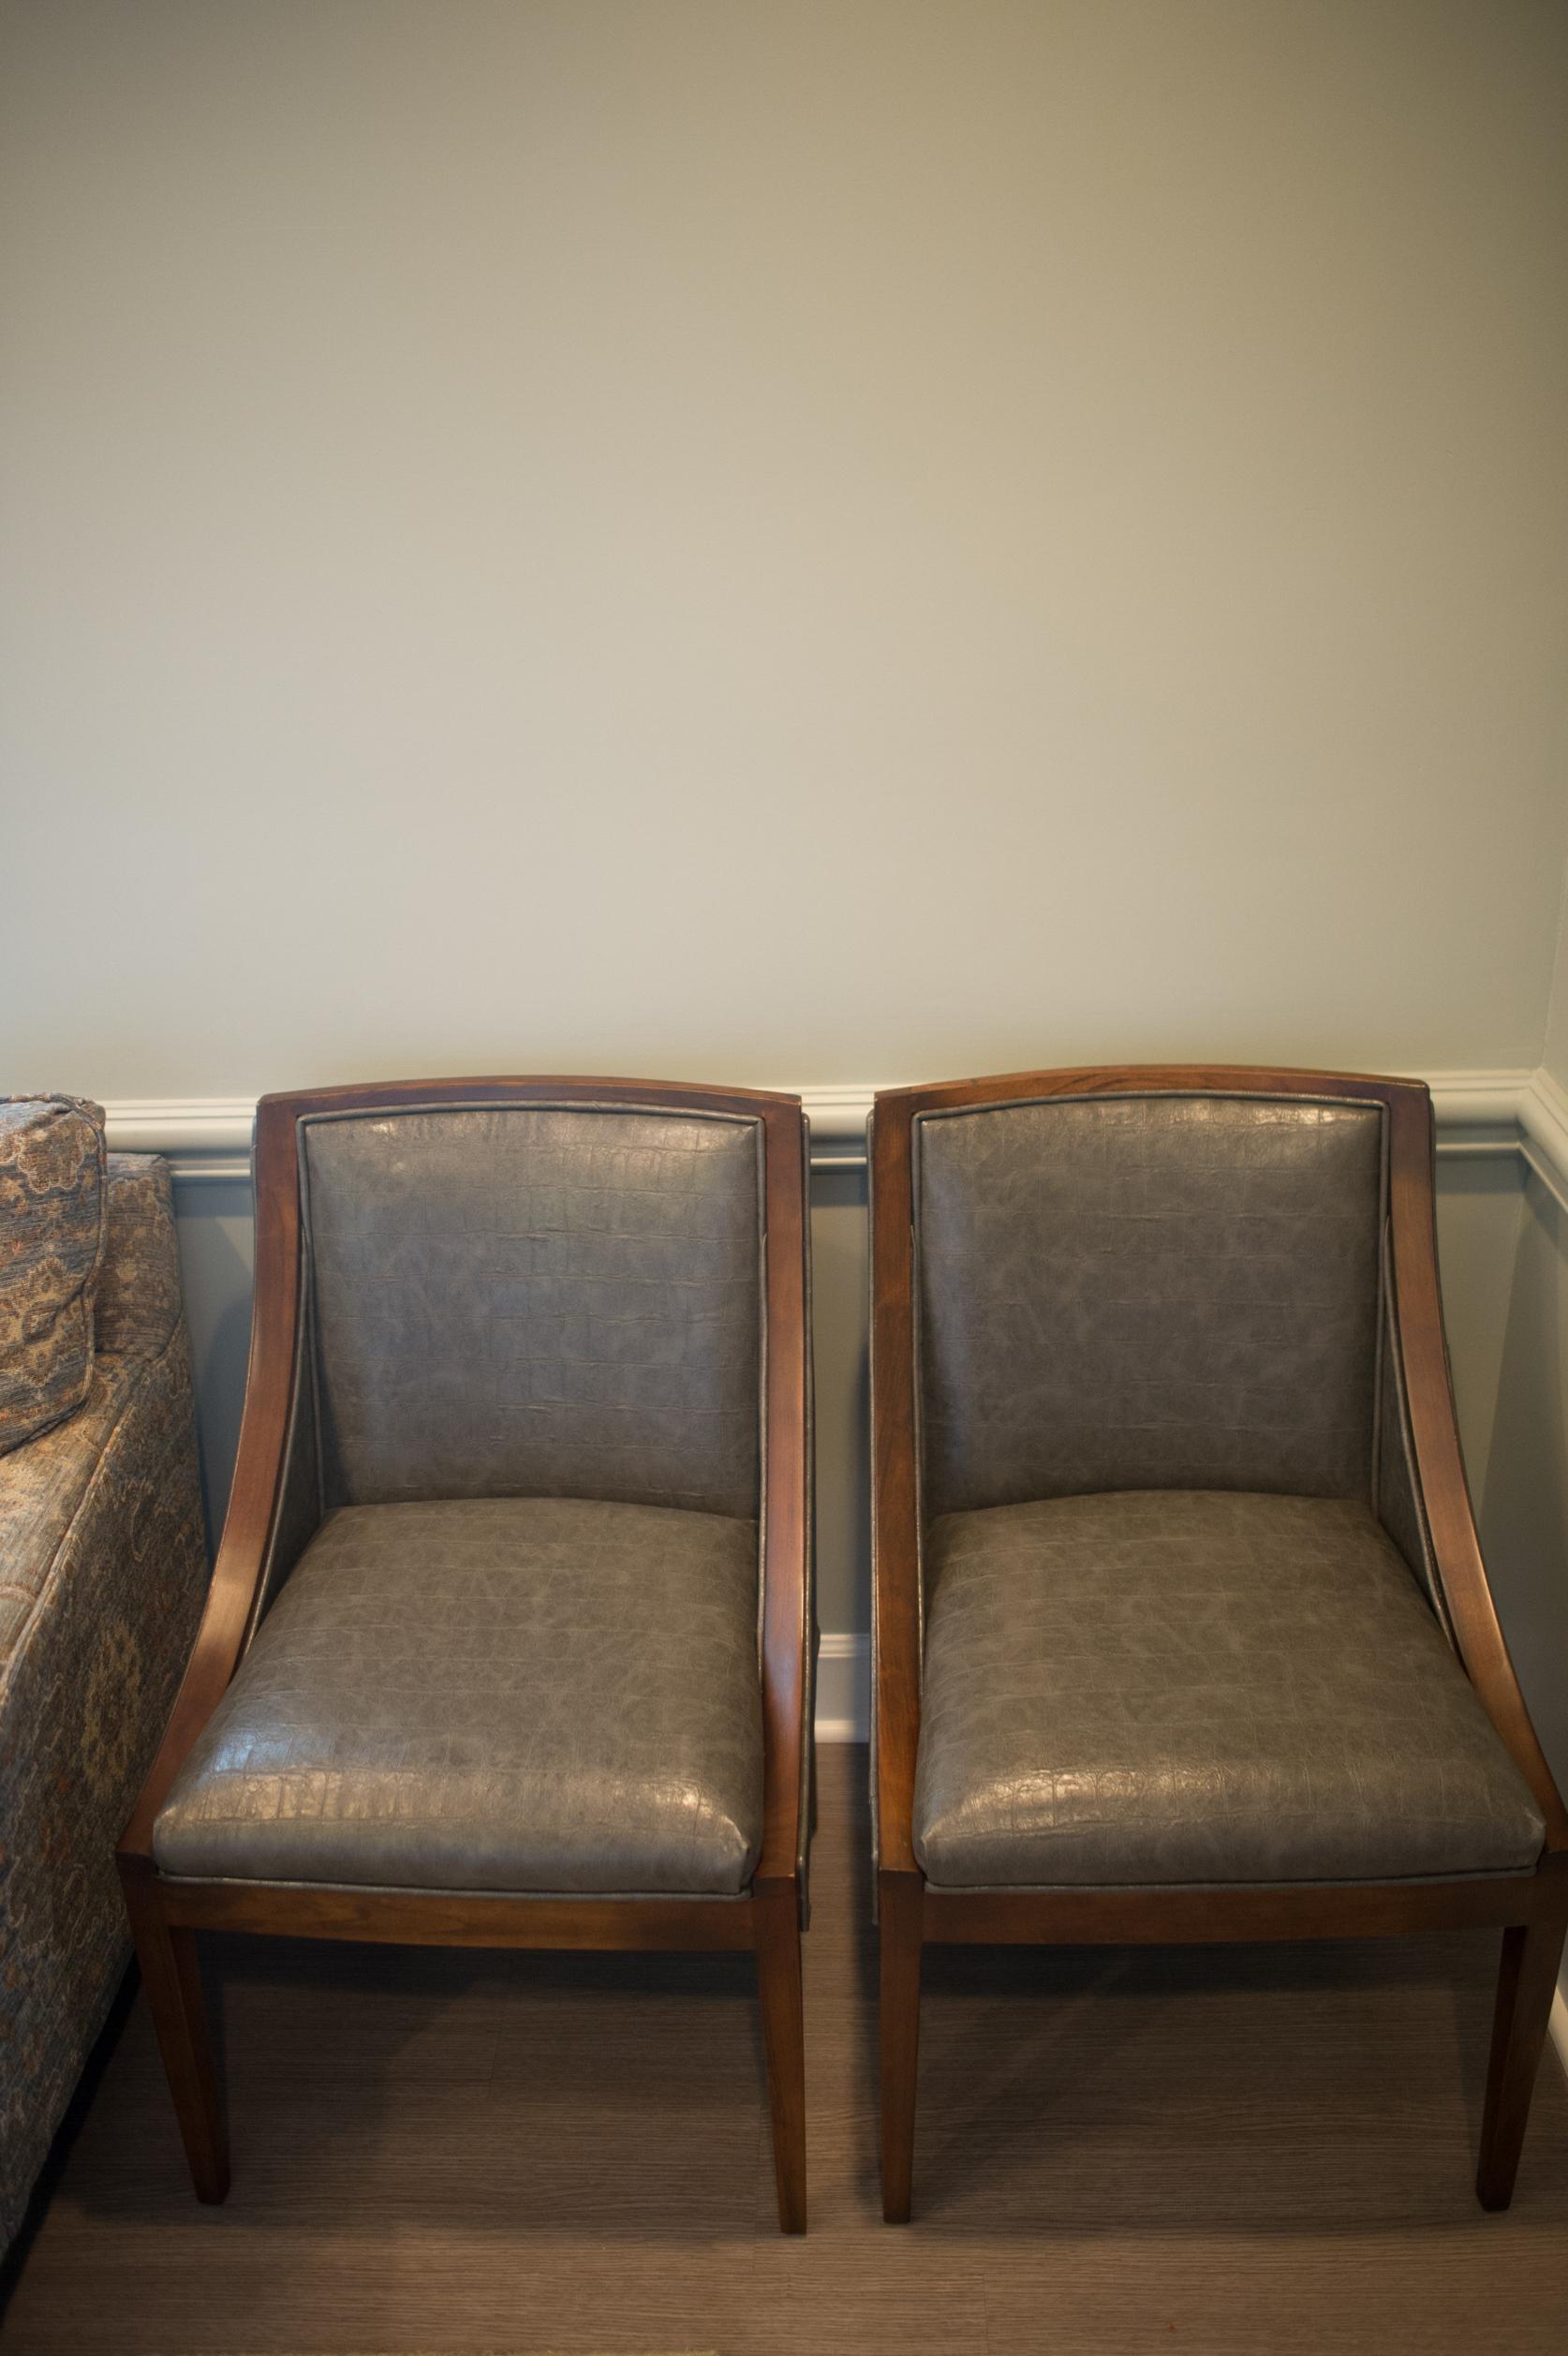 custom seating in medical waiting room